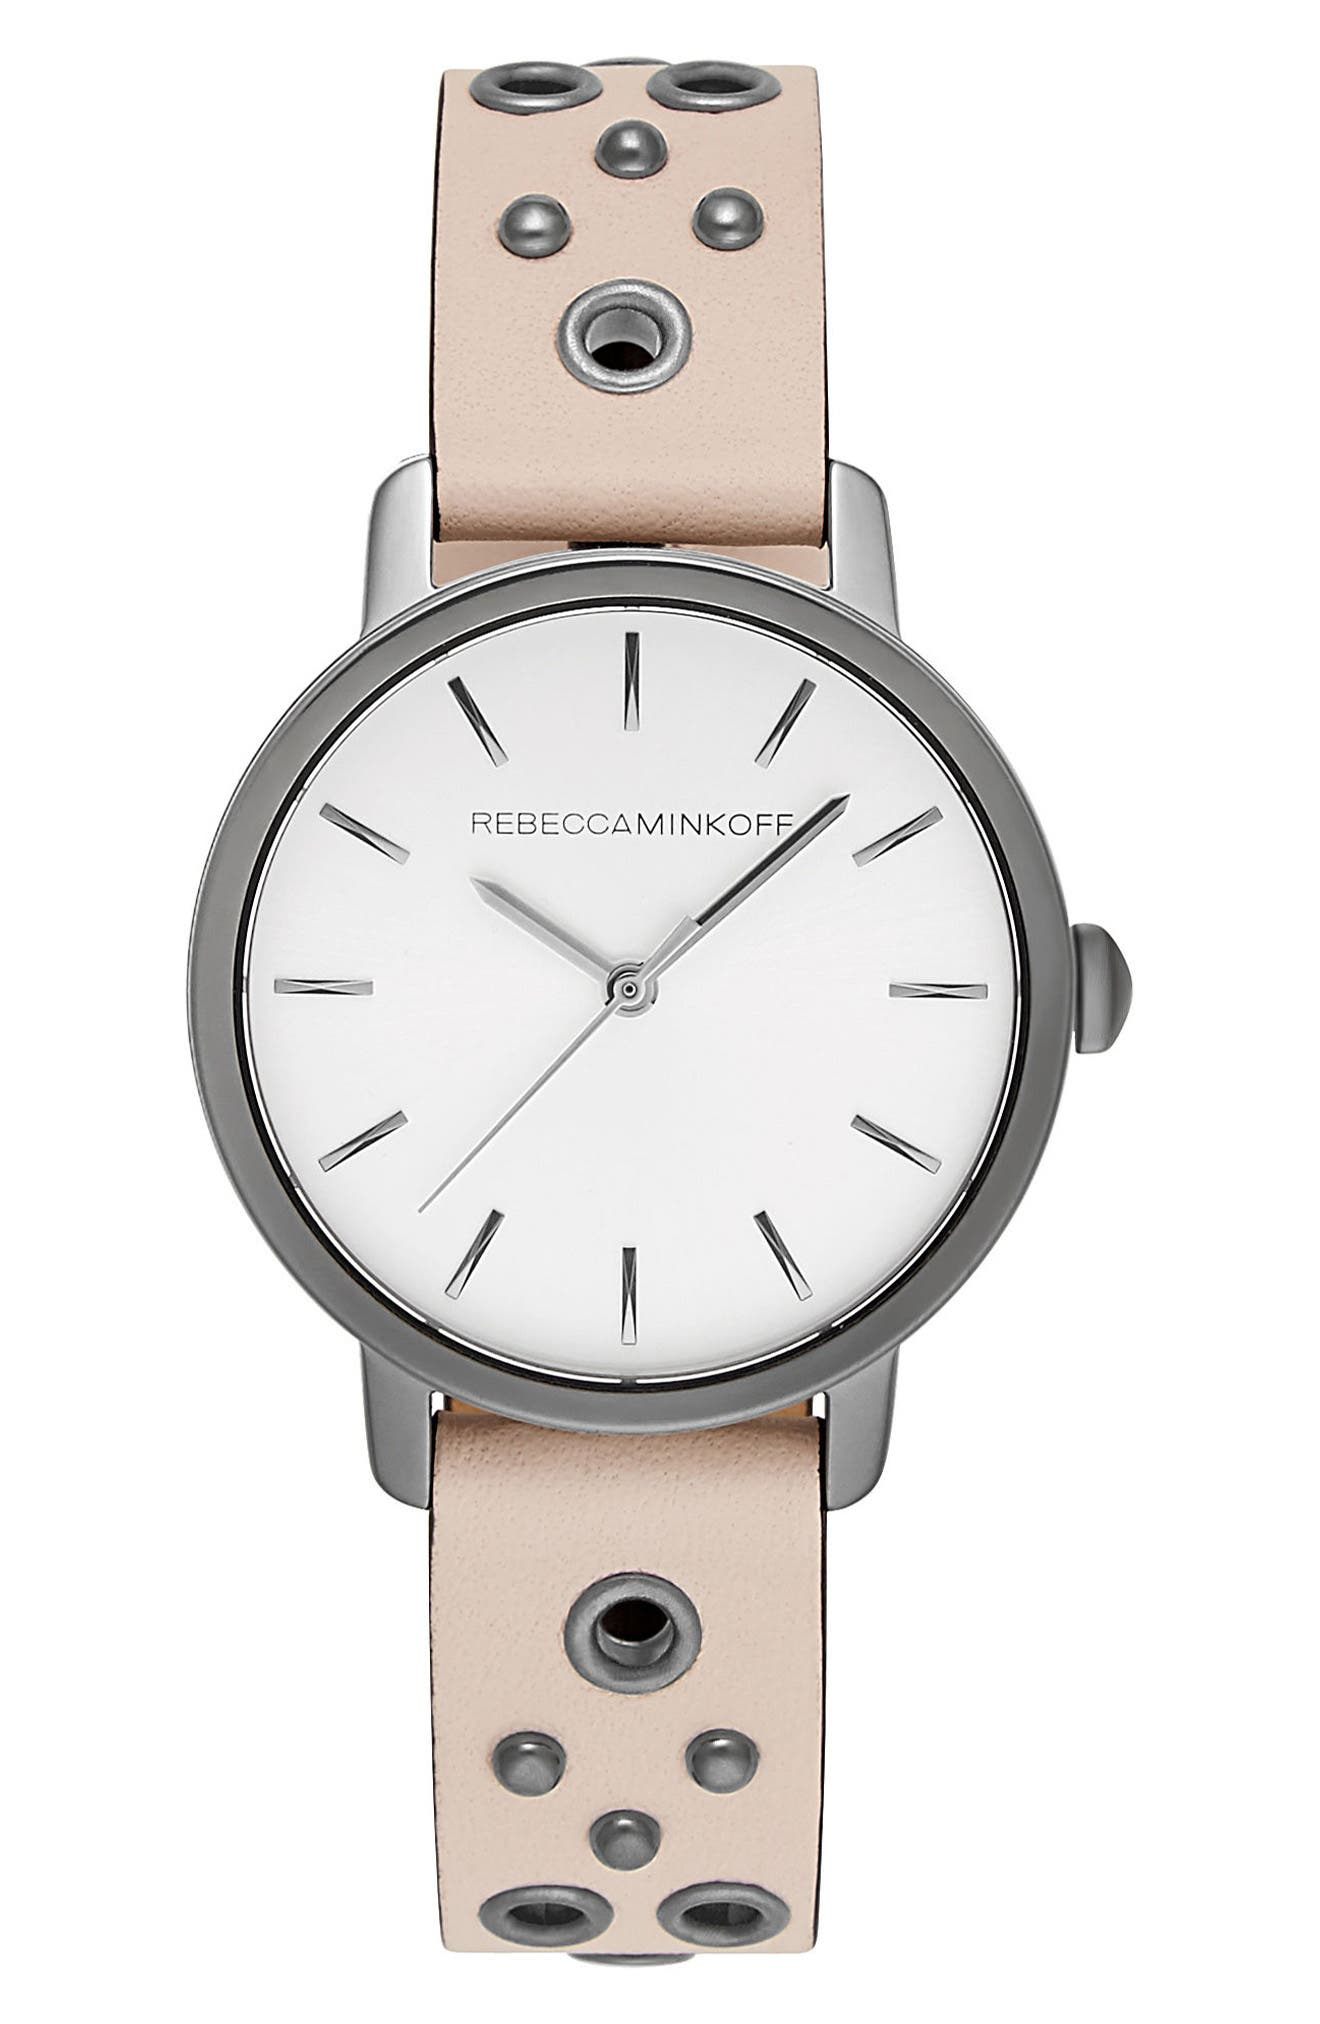 Rebecca Minkoff BFFL Embellished Leather Strap Watch, 36mm